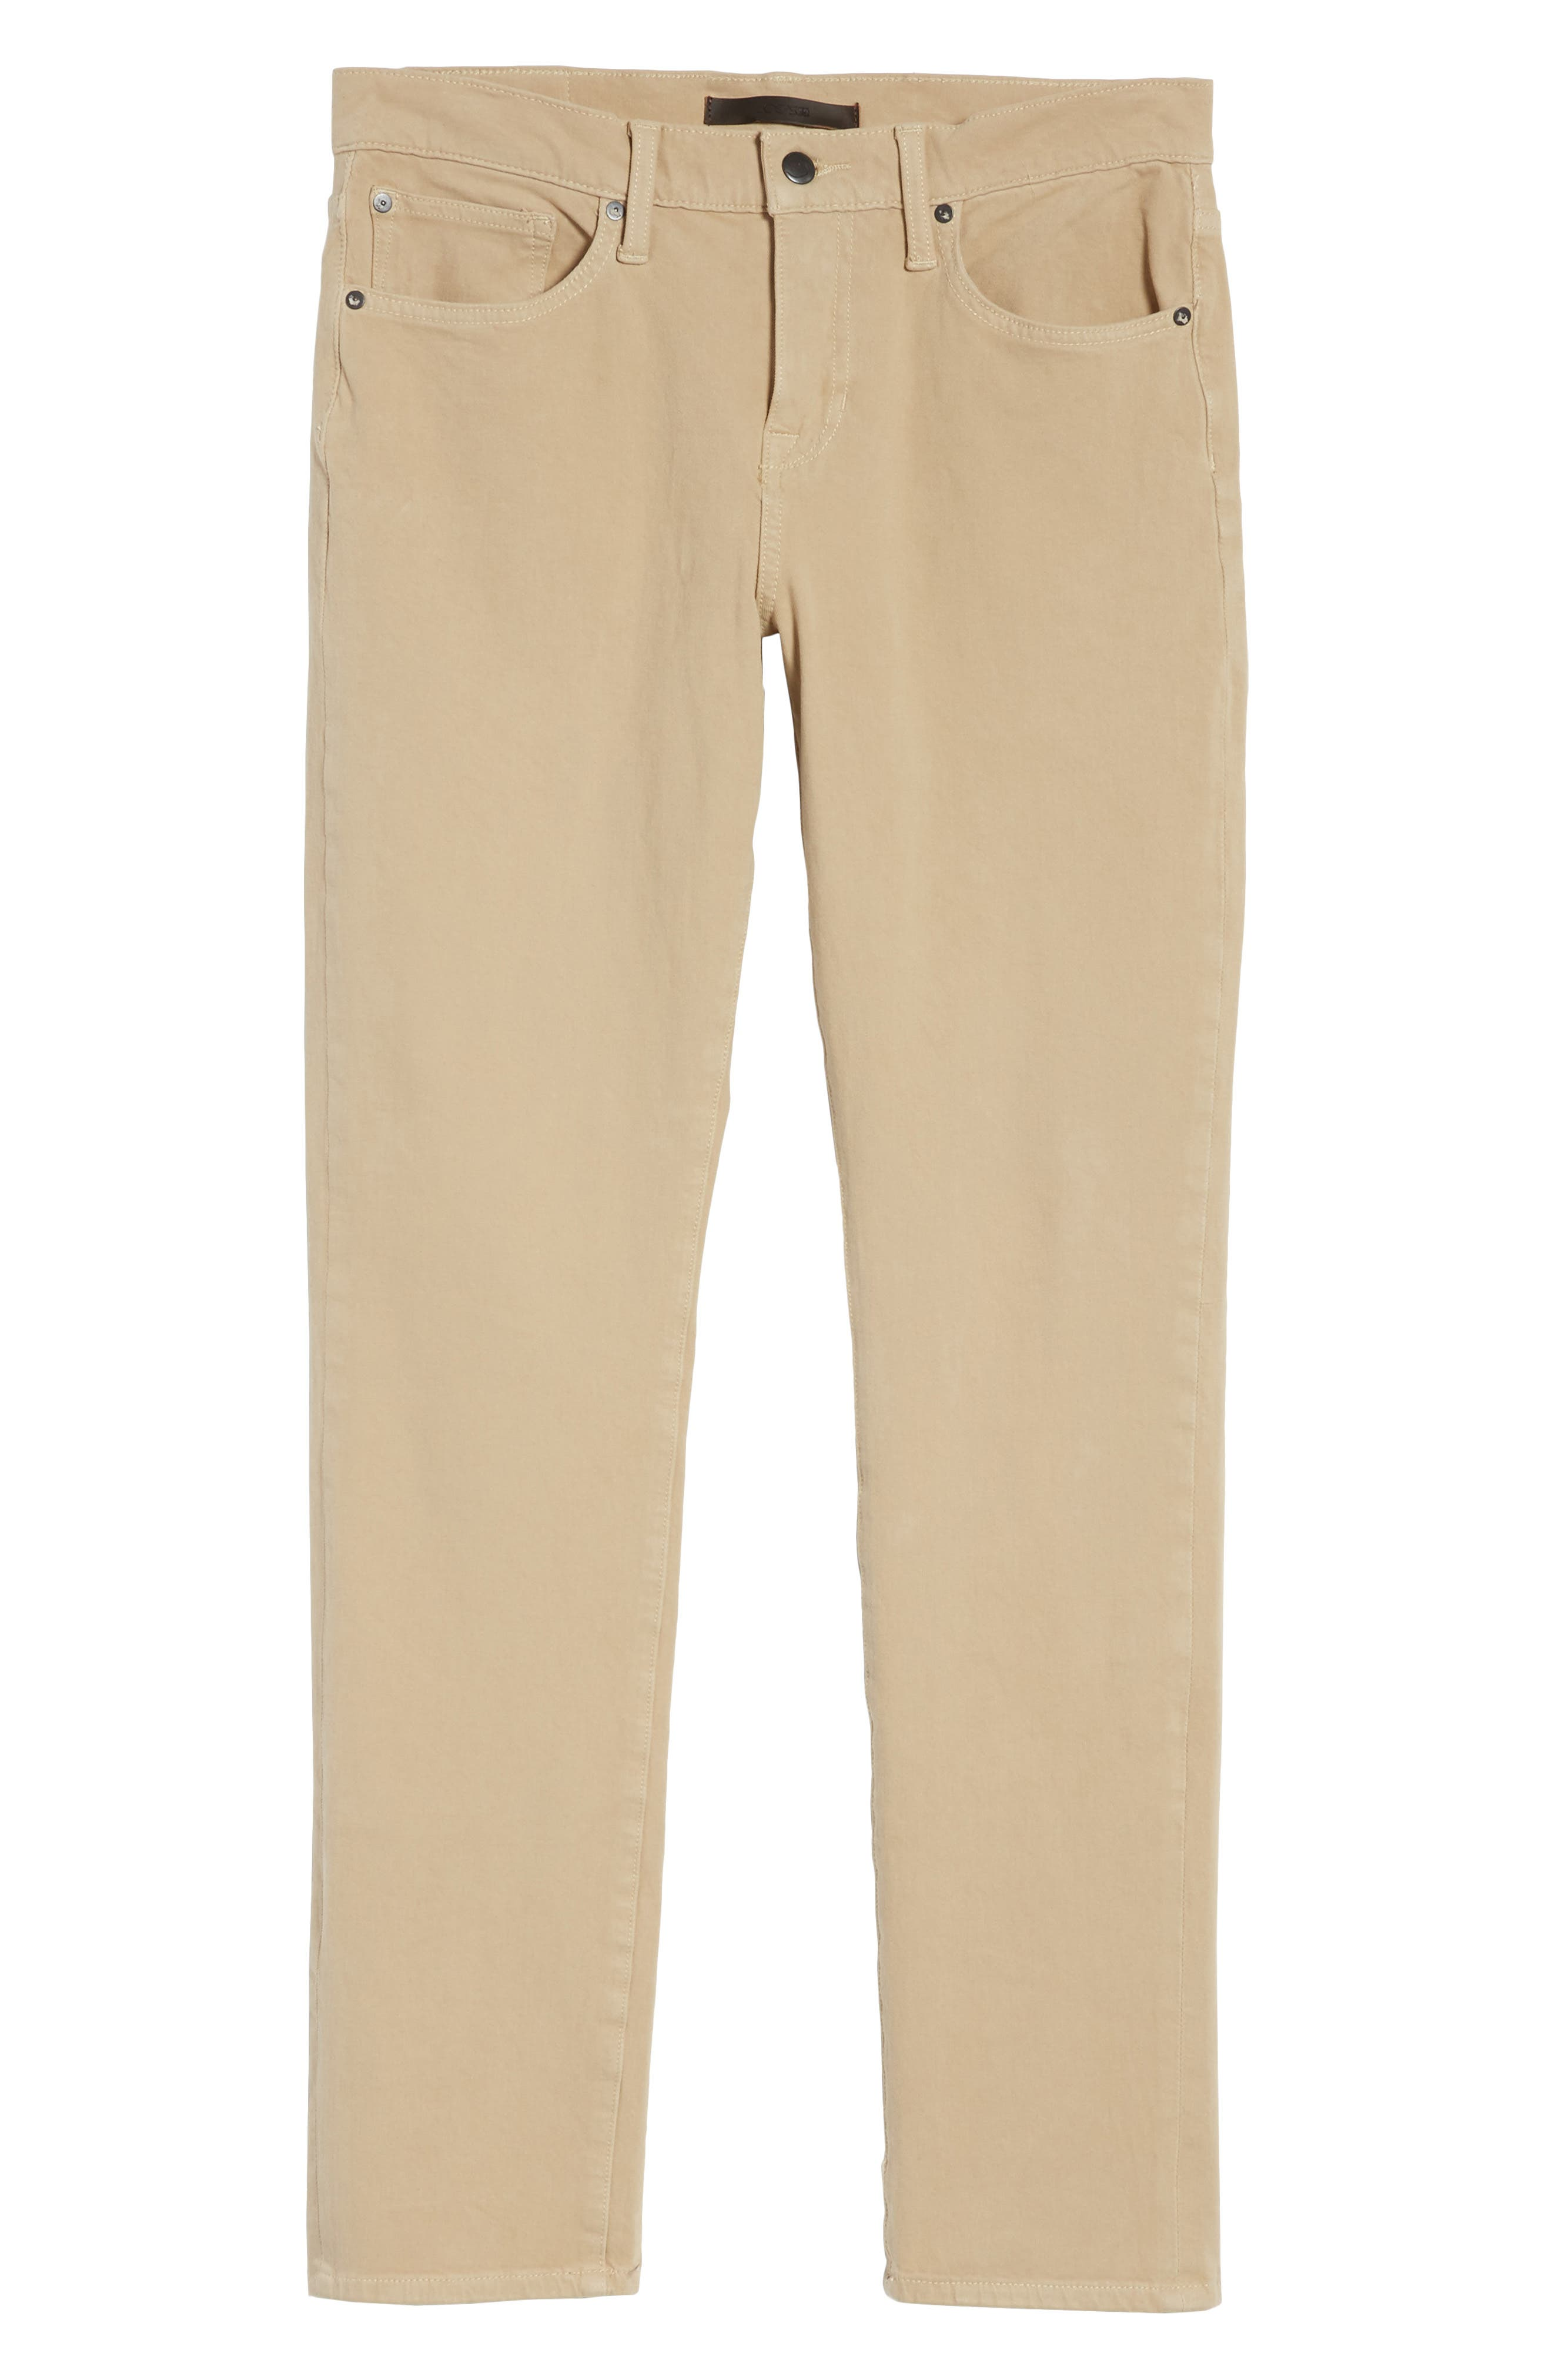 JOE'S,                             Kinetic Slim Fit Jeans,                             Alternate thumbnail 6, color,                             SAND